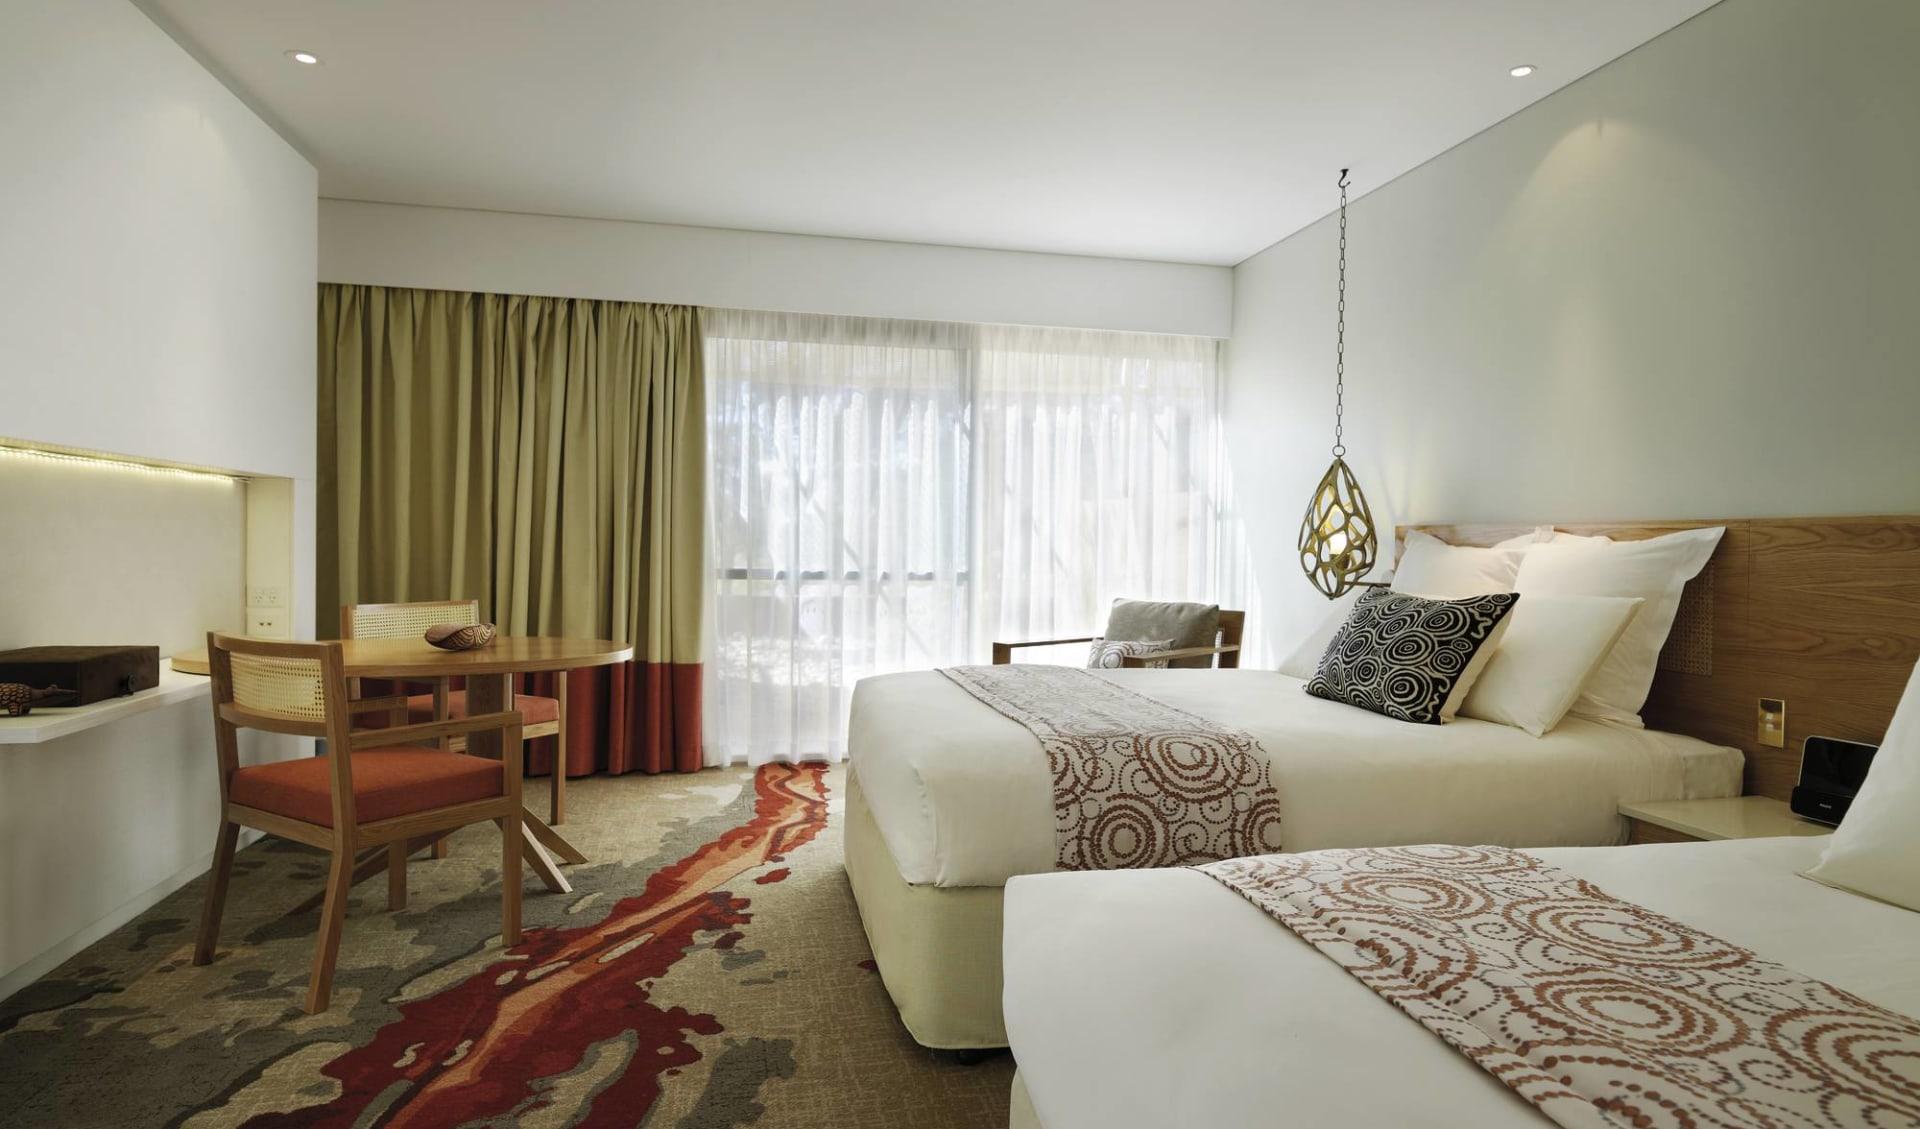 Sails in the Desert Hotel in Ayers Rock - Yulara:  Sails in the Desert Hotel - Superior Room